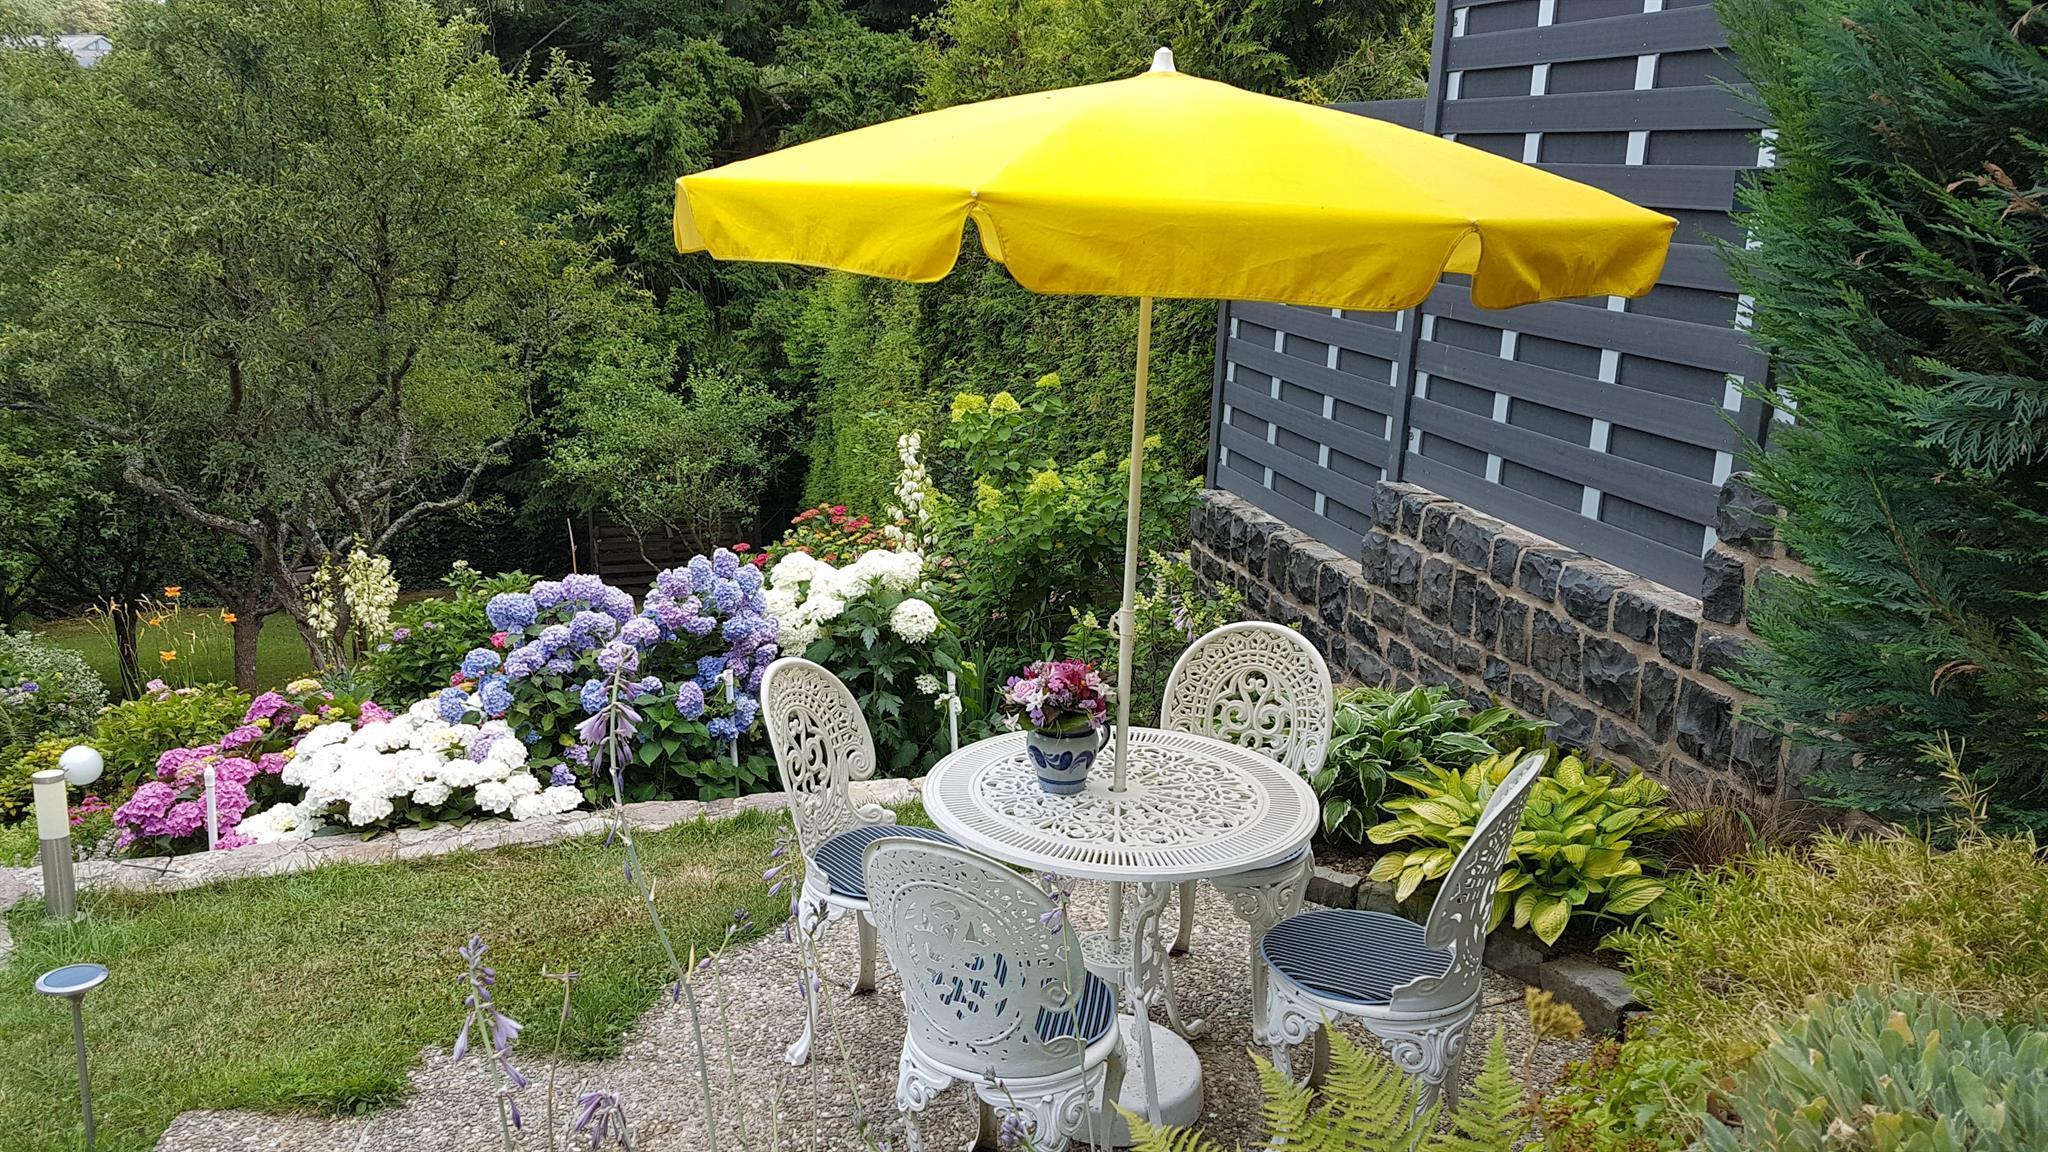 Café-Ecke im Garten